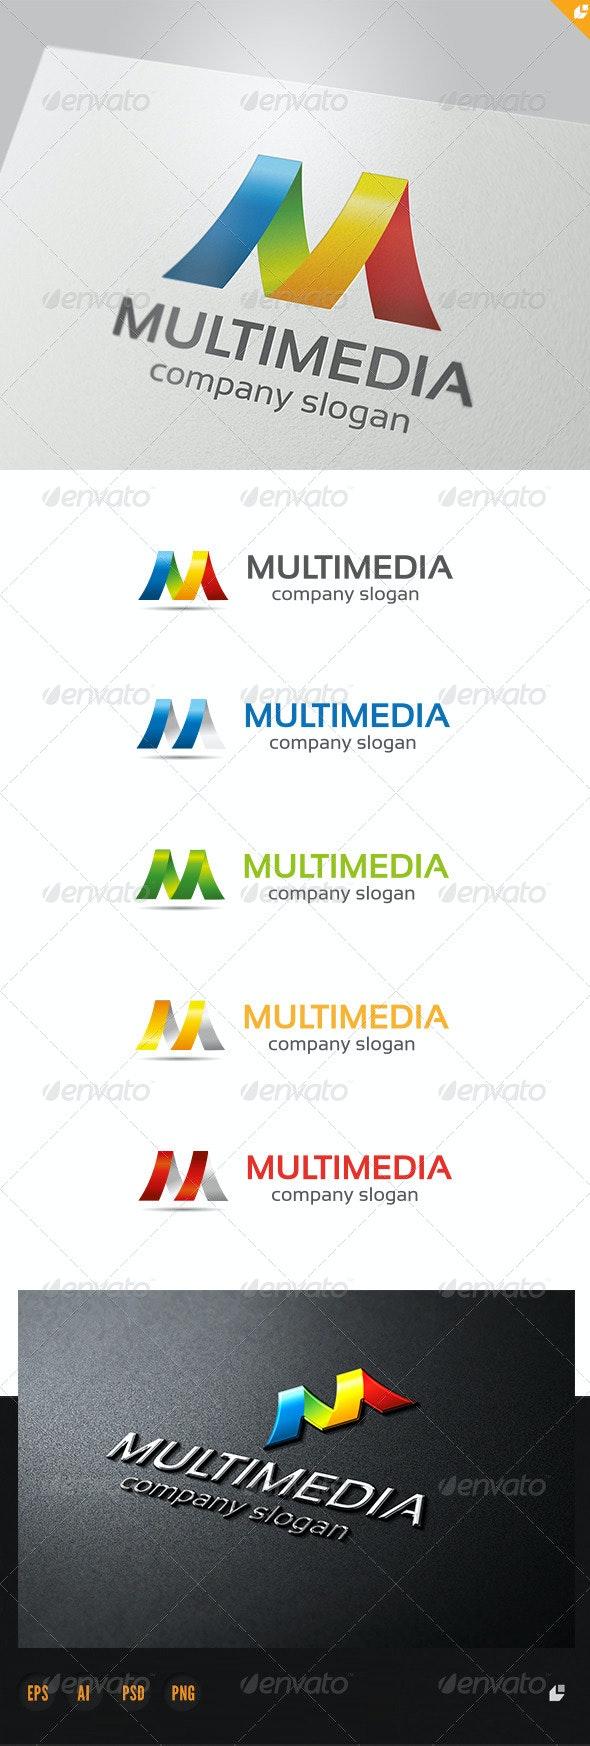 Multimedia Logo - 3d Abstract